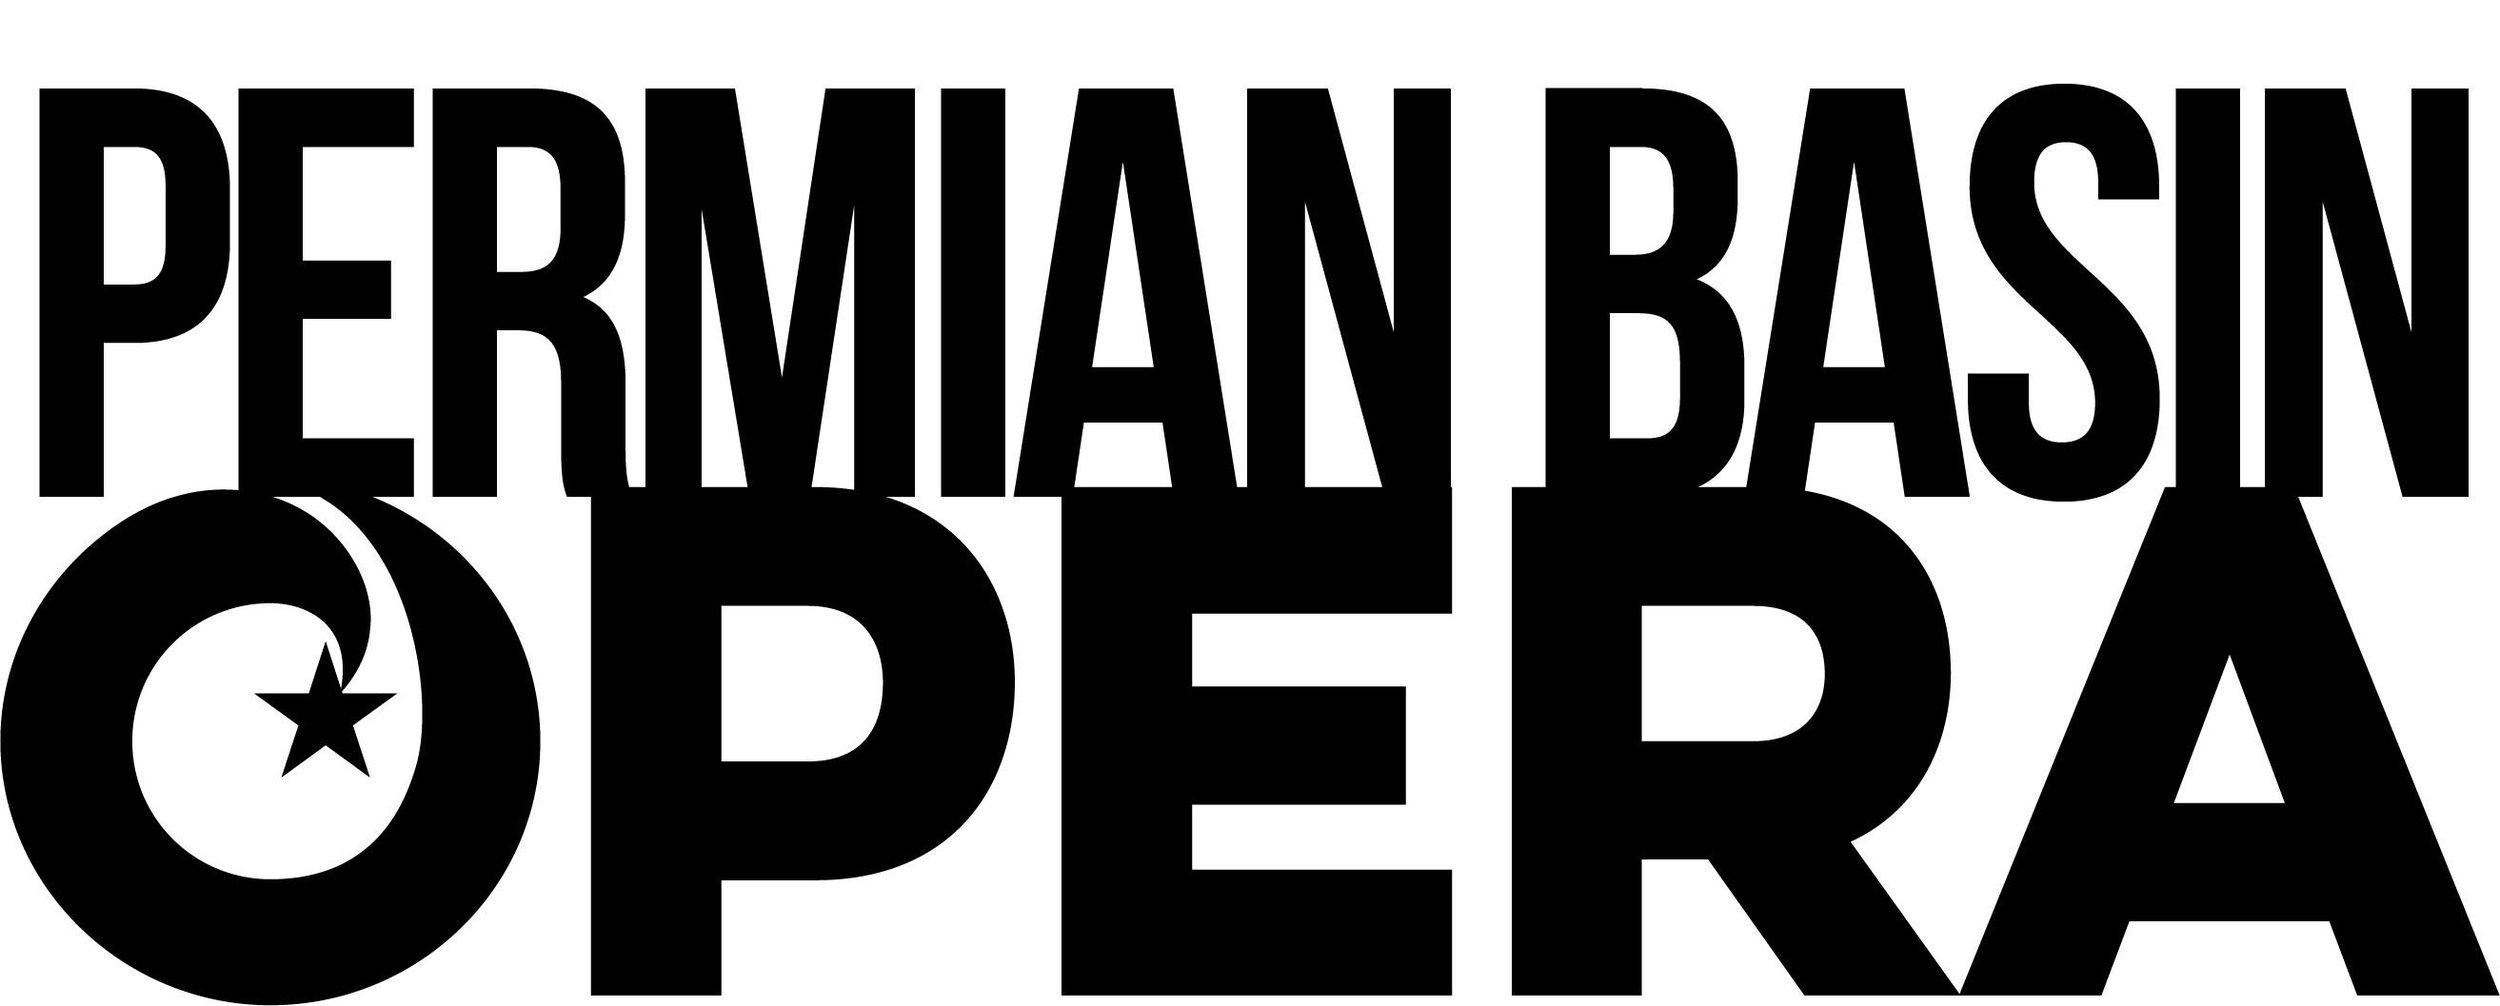 Permian Basin logo.jpg